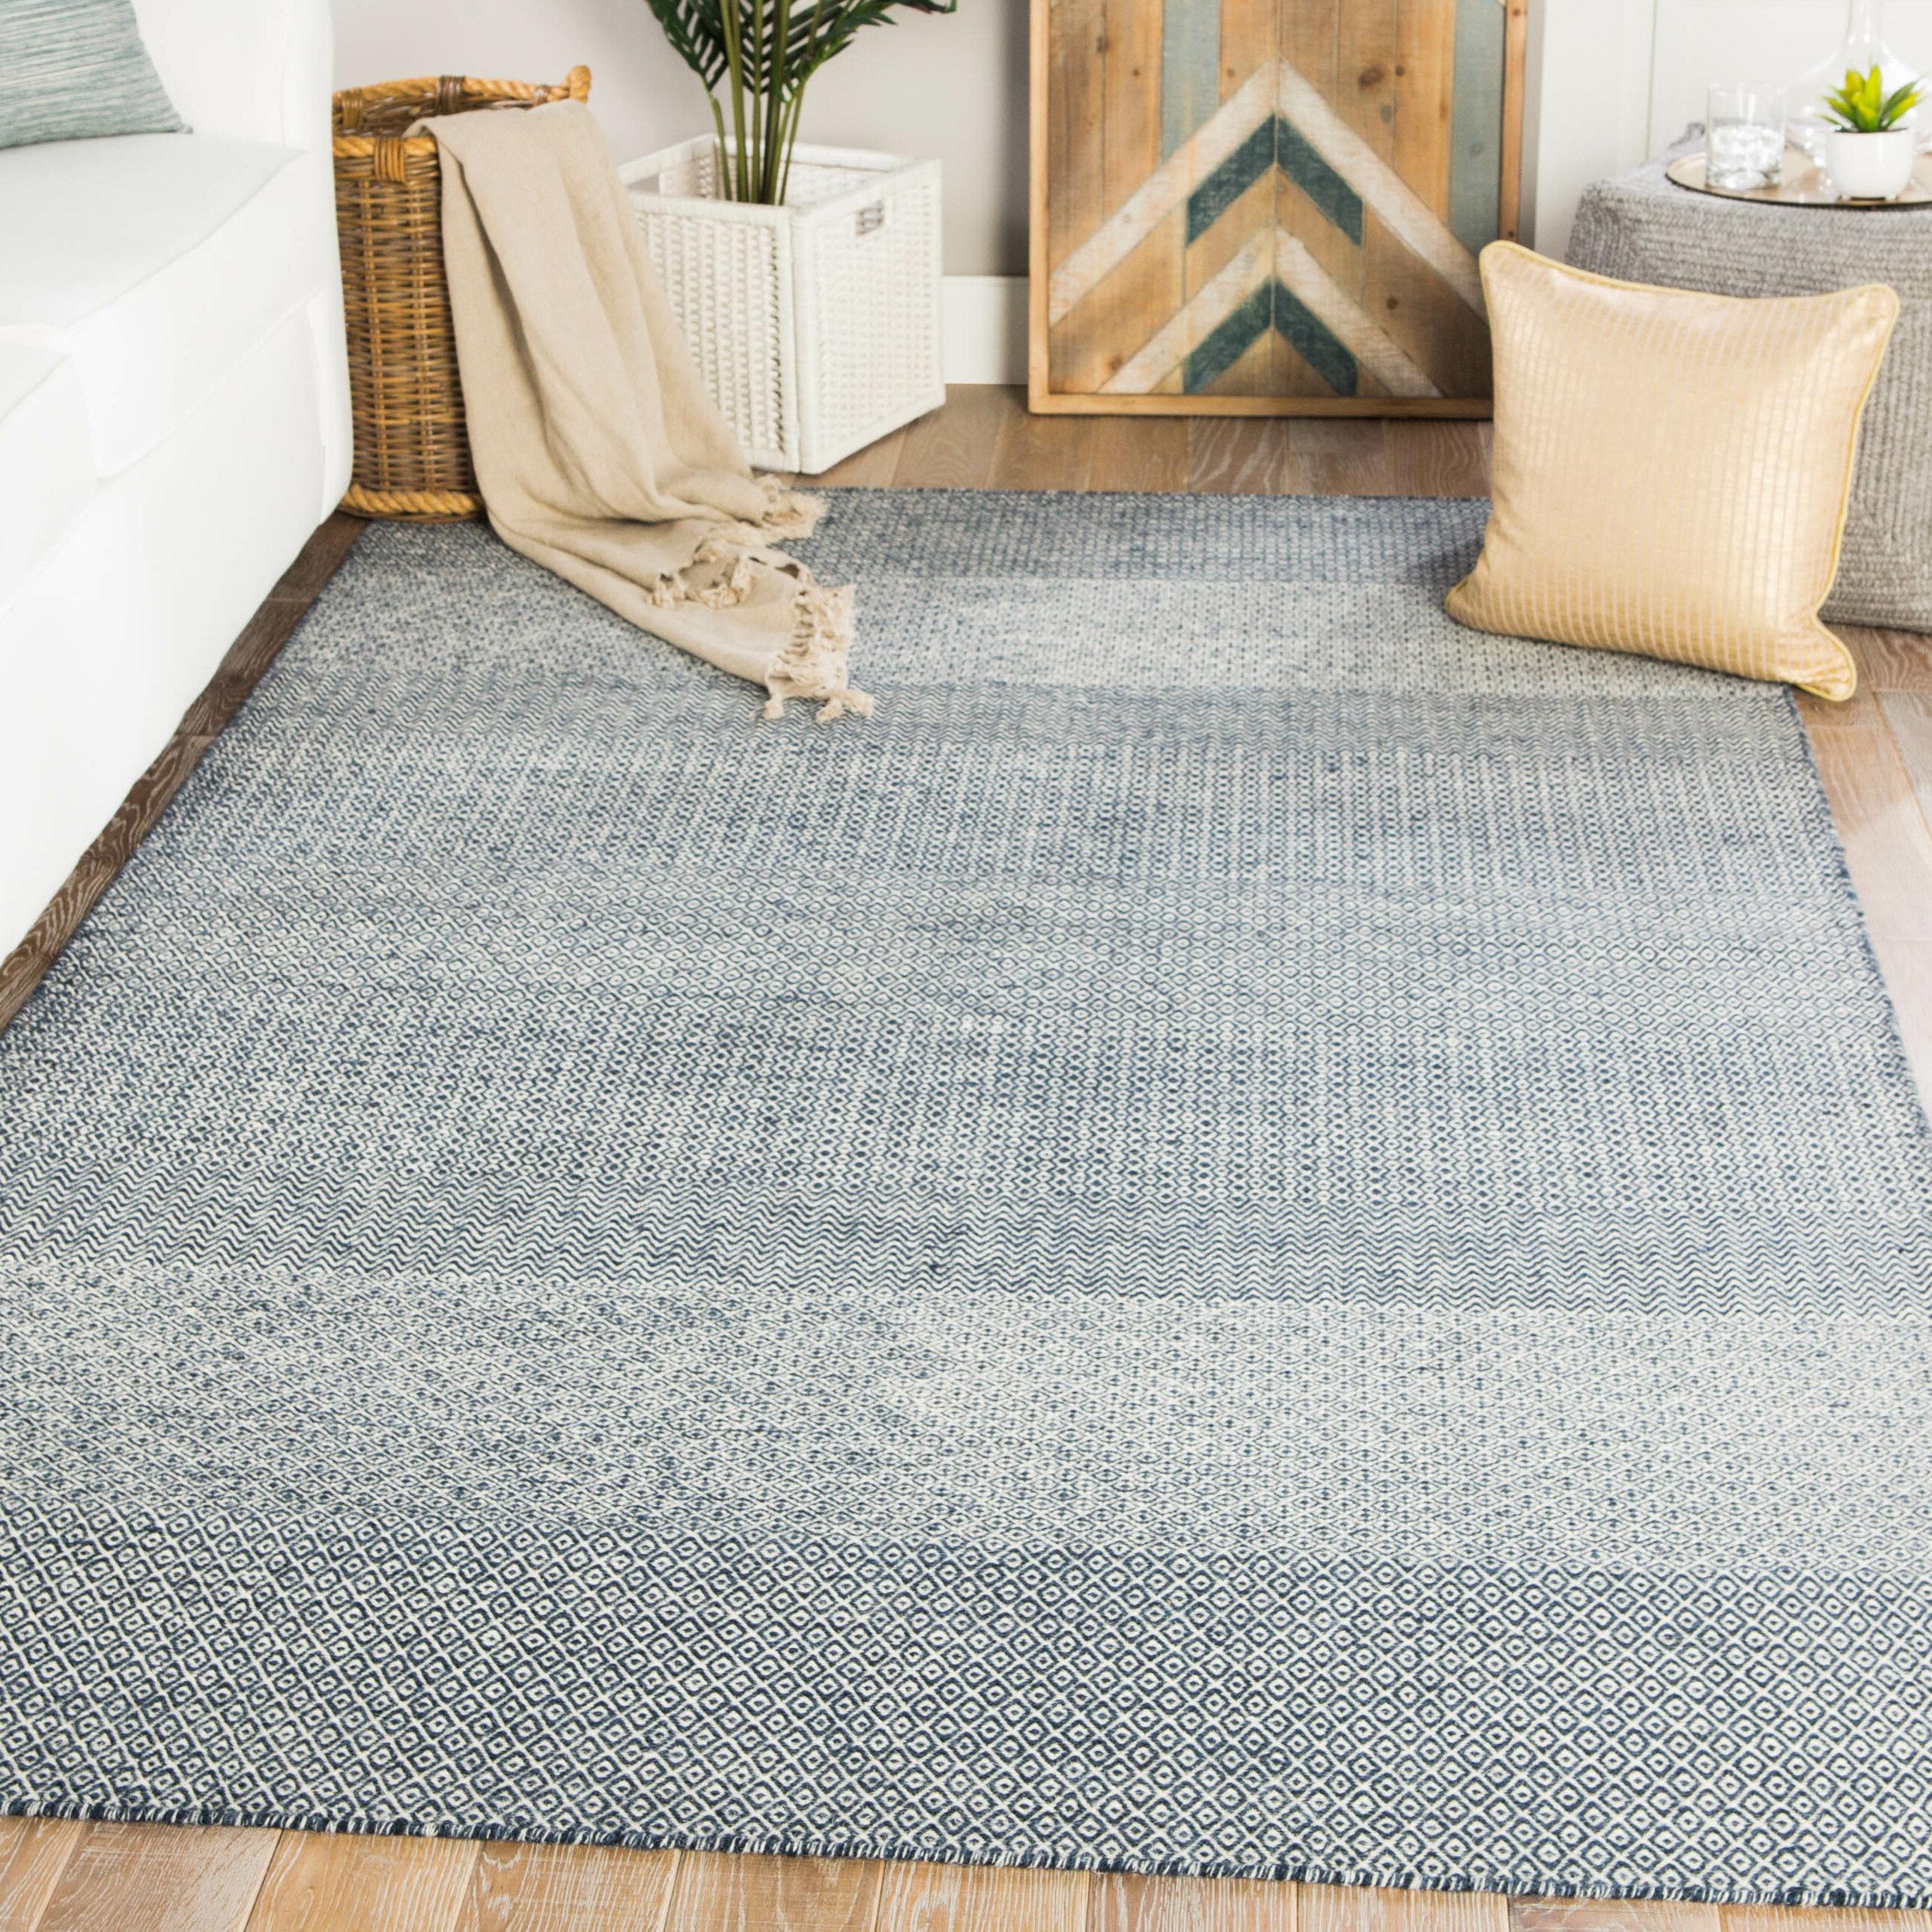 Union Rustic Prescott Geometric Handwoven Wool Dark Blue Area Rug Reviews Wayfair